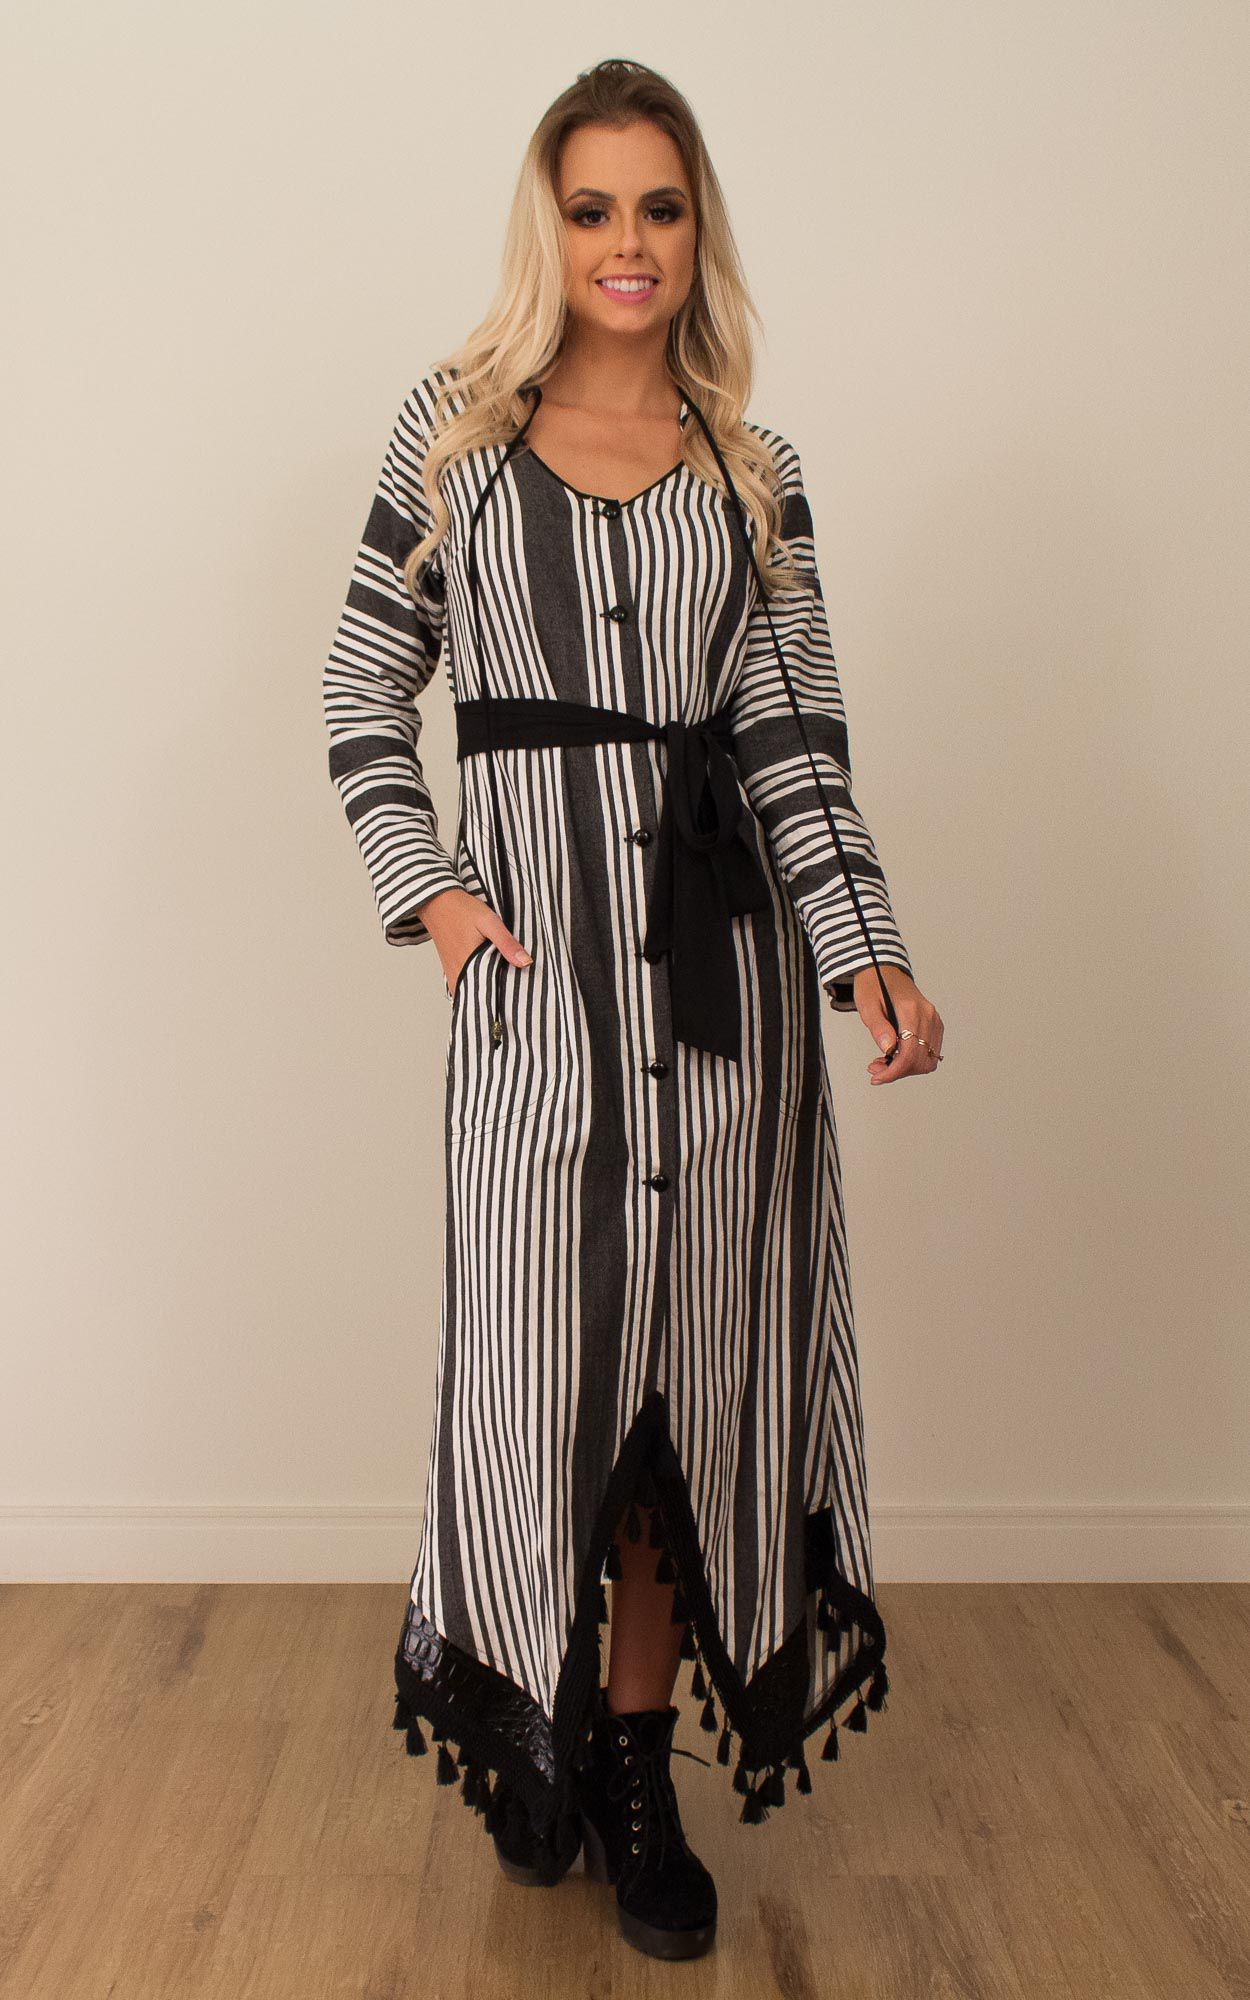 Vestido midi manga longa com detalhes em franja